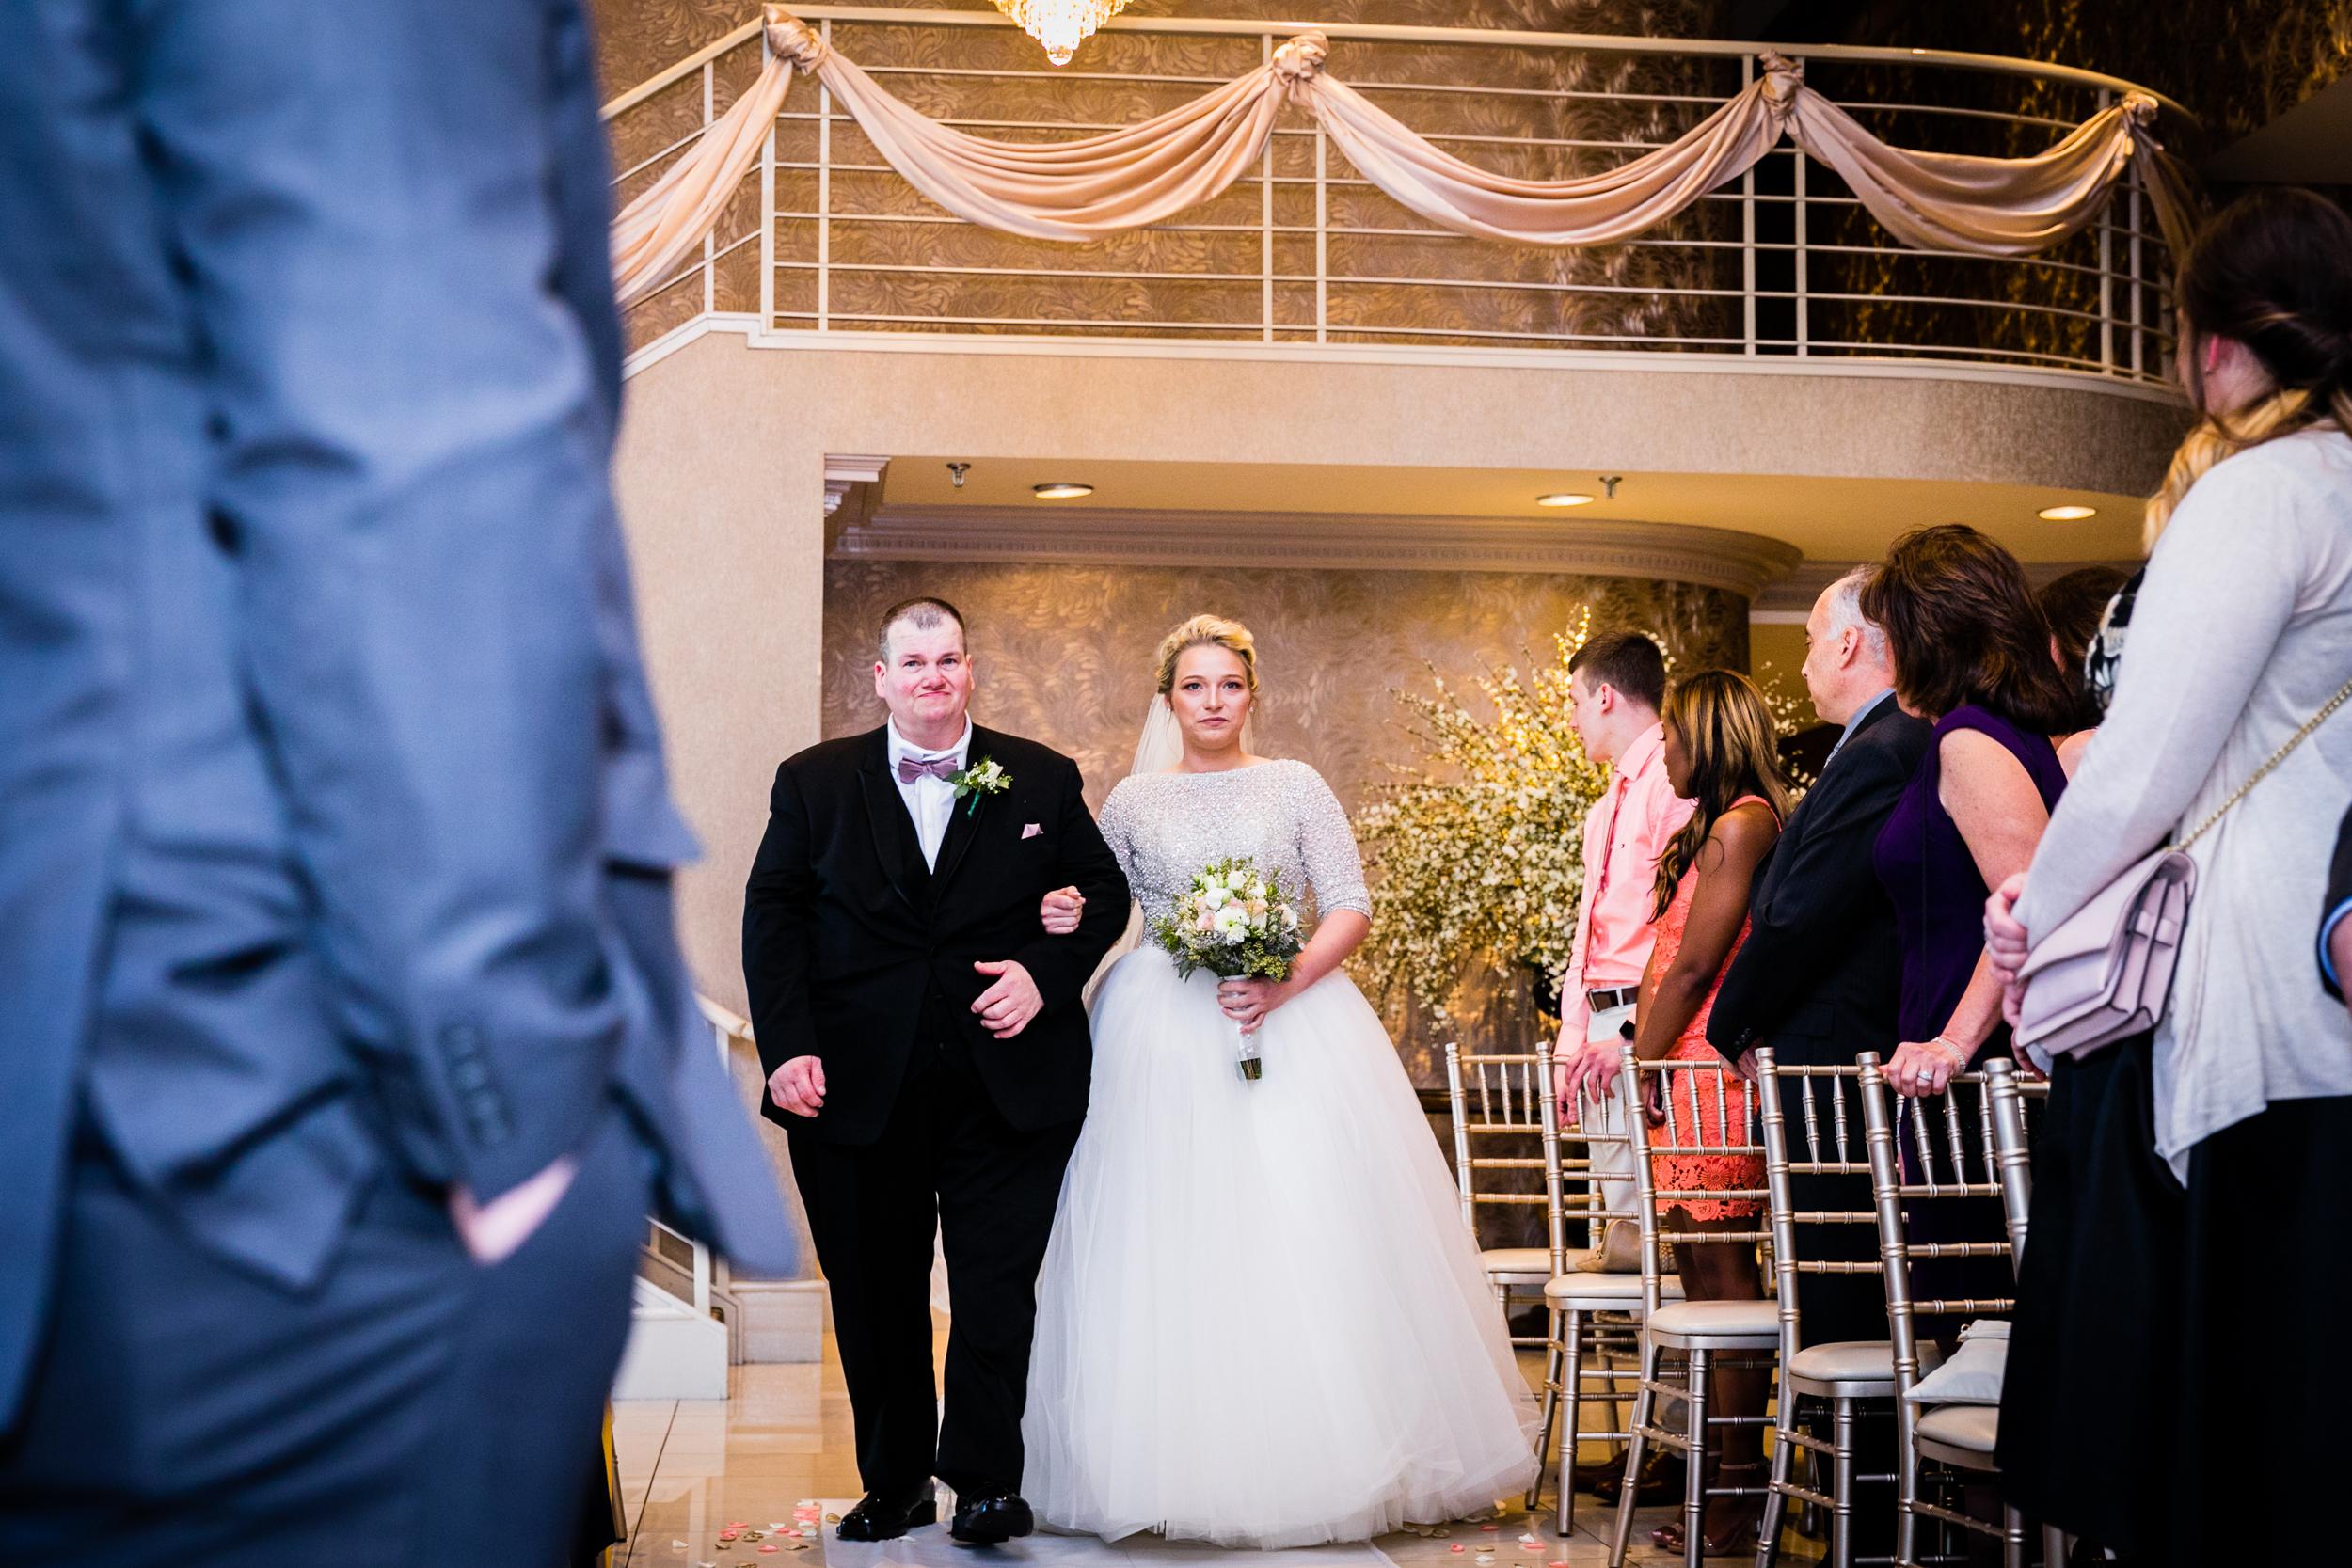 CELEBRATIONS BENSALEM WEDDING PHOTOGRAPHY-47.jpg